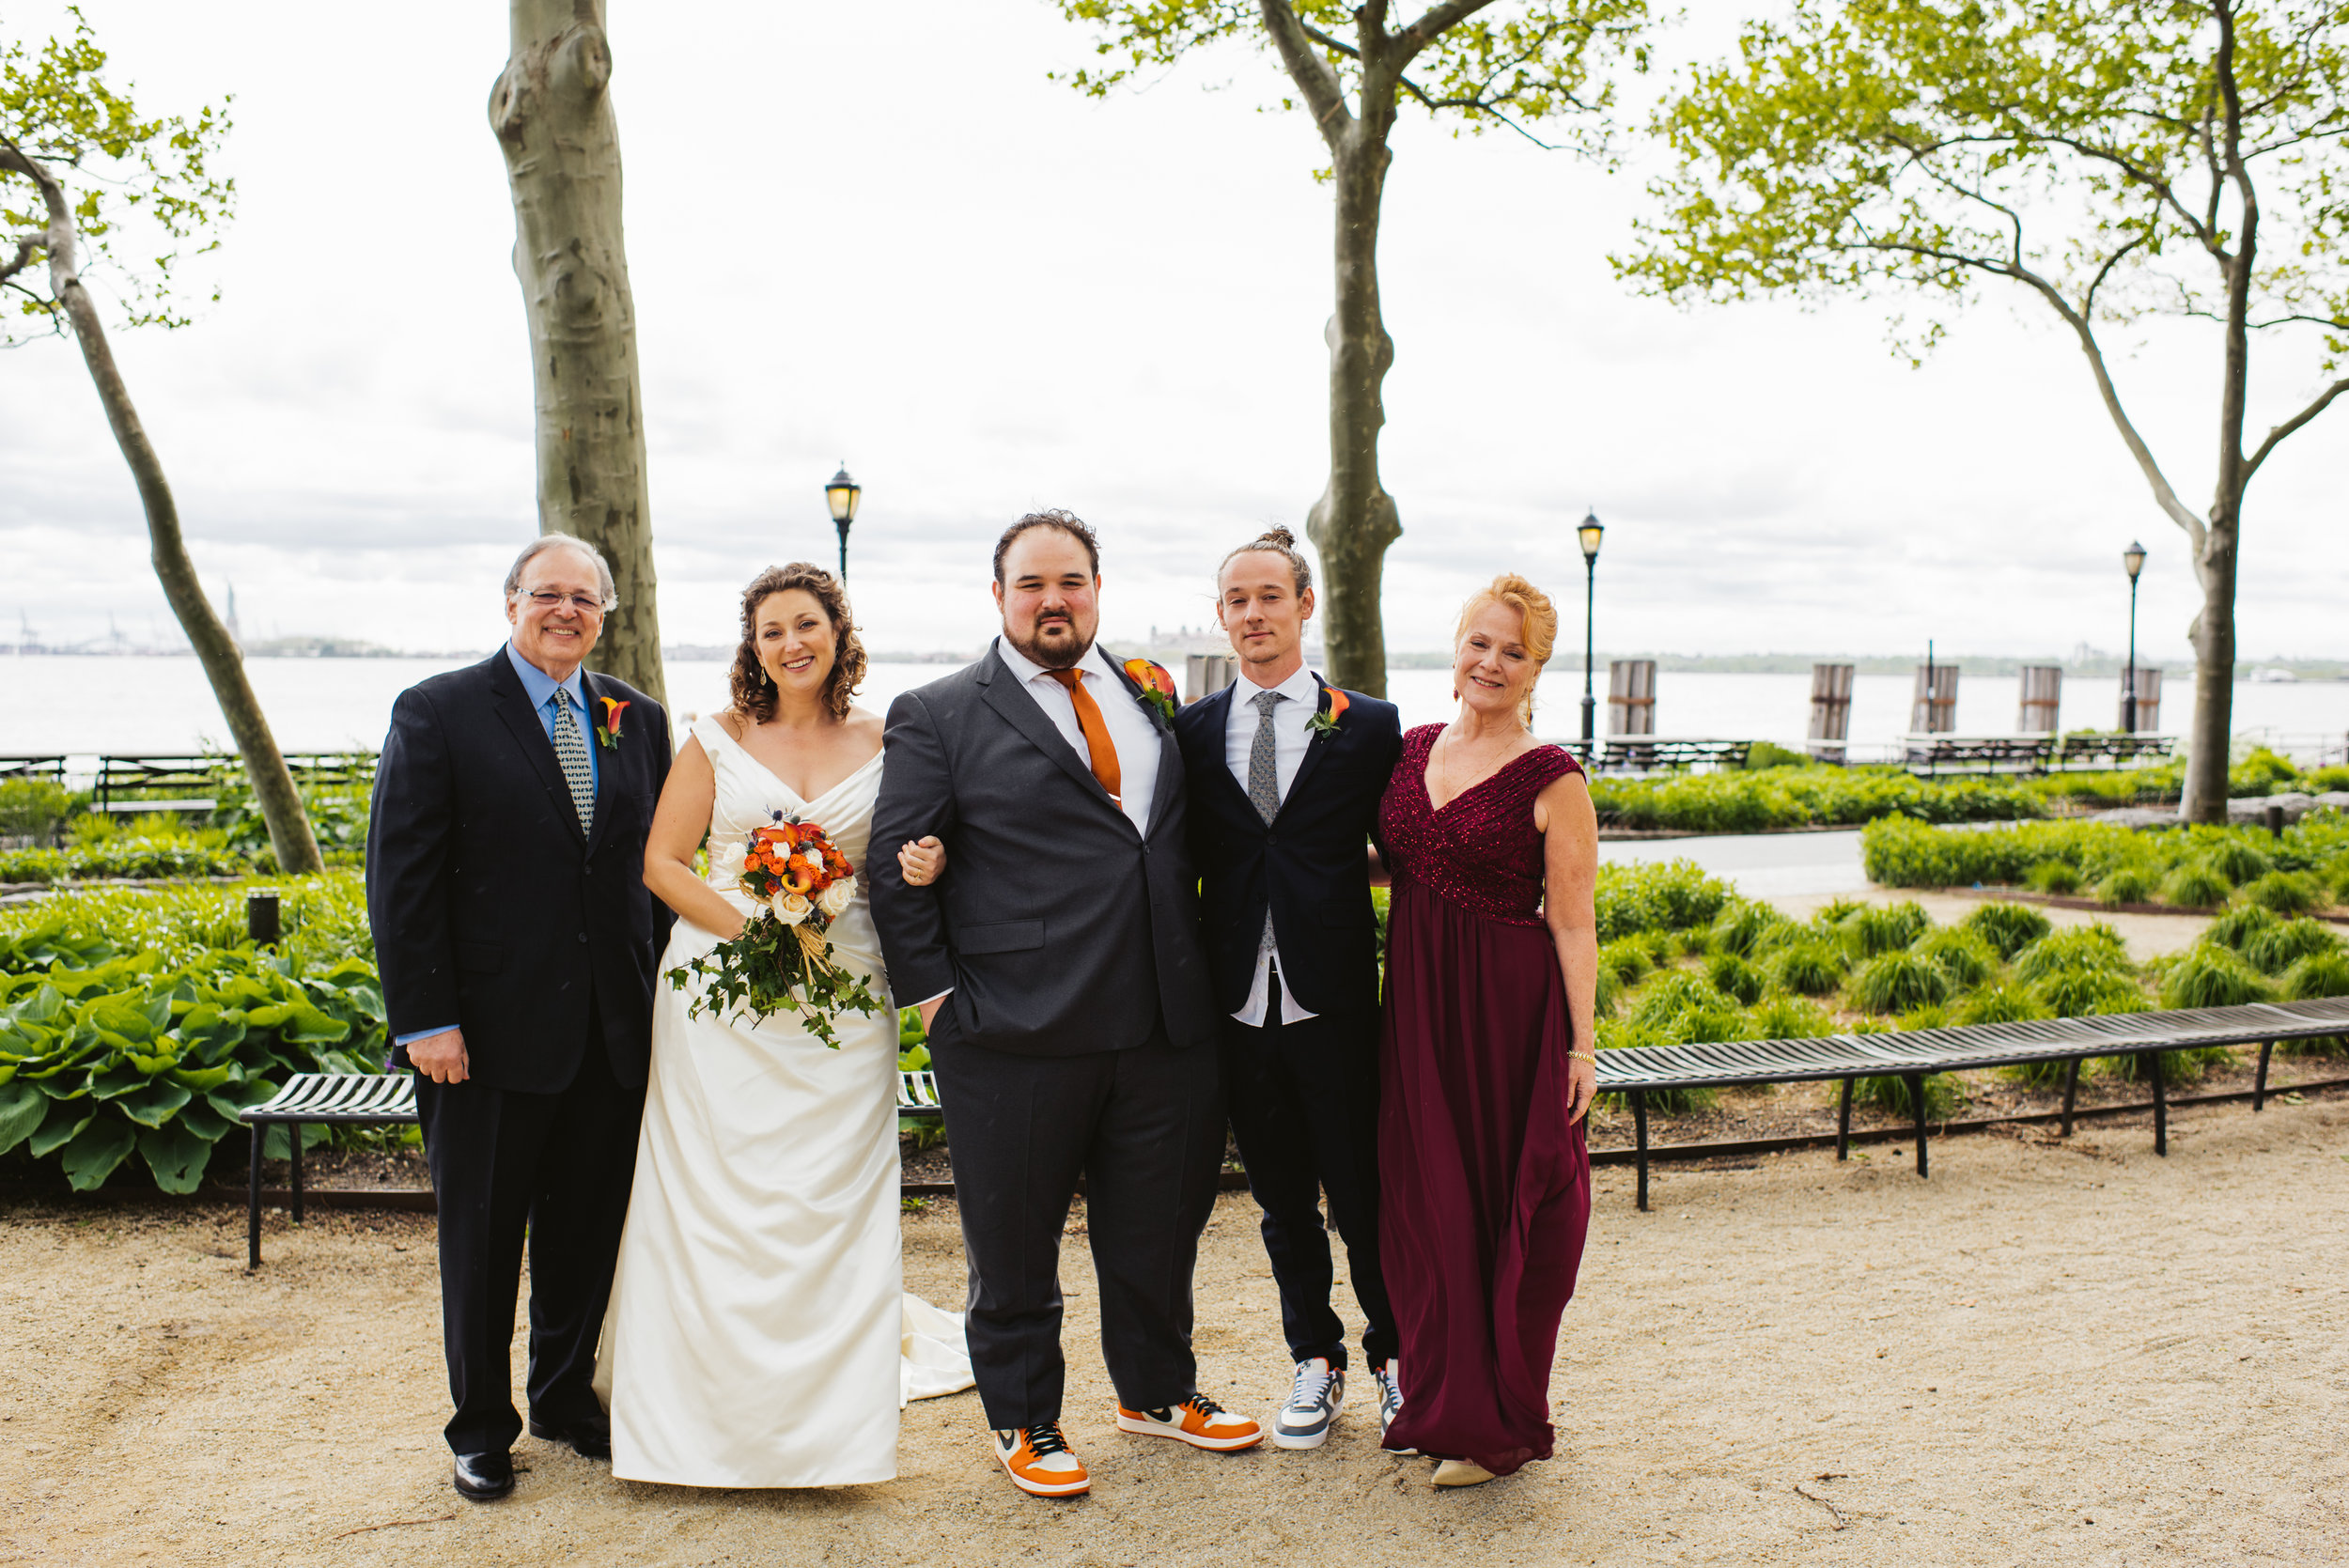 LIZA & JON - BATTERY PARK WEDDING - NYC INTIMATE WEDDING PHOTOGRAPHER - CHI-CHI AGBIM-217.jpg